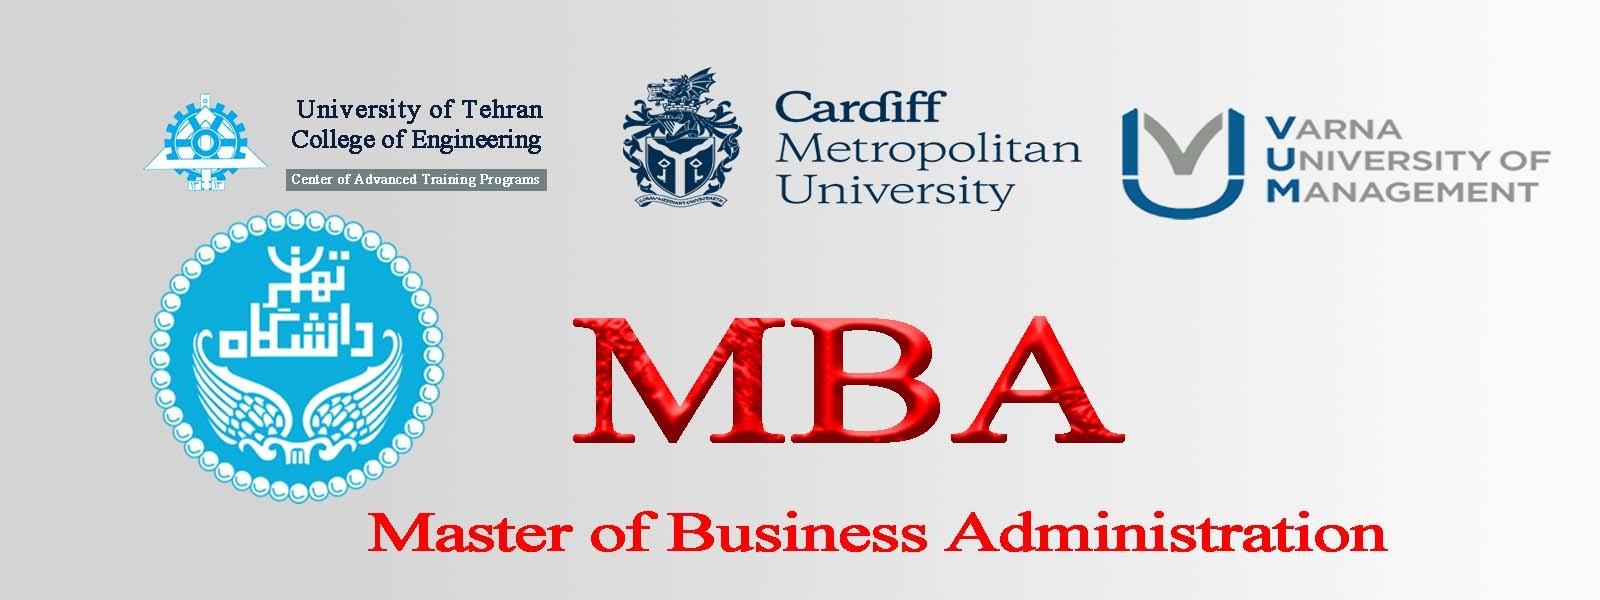 پذیرش کارشناسی ارشد بینالمللی مدیریت کسب و کار